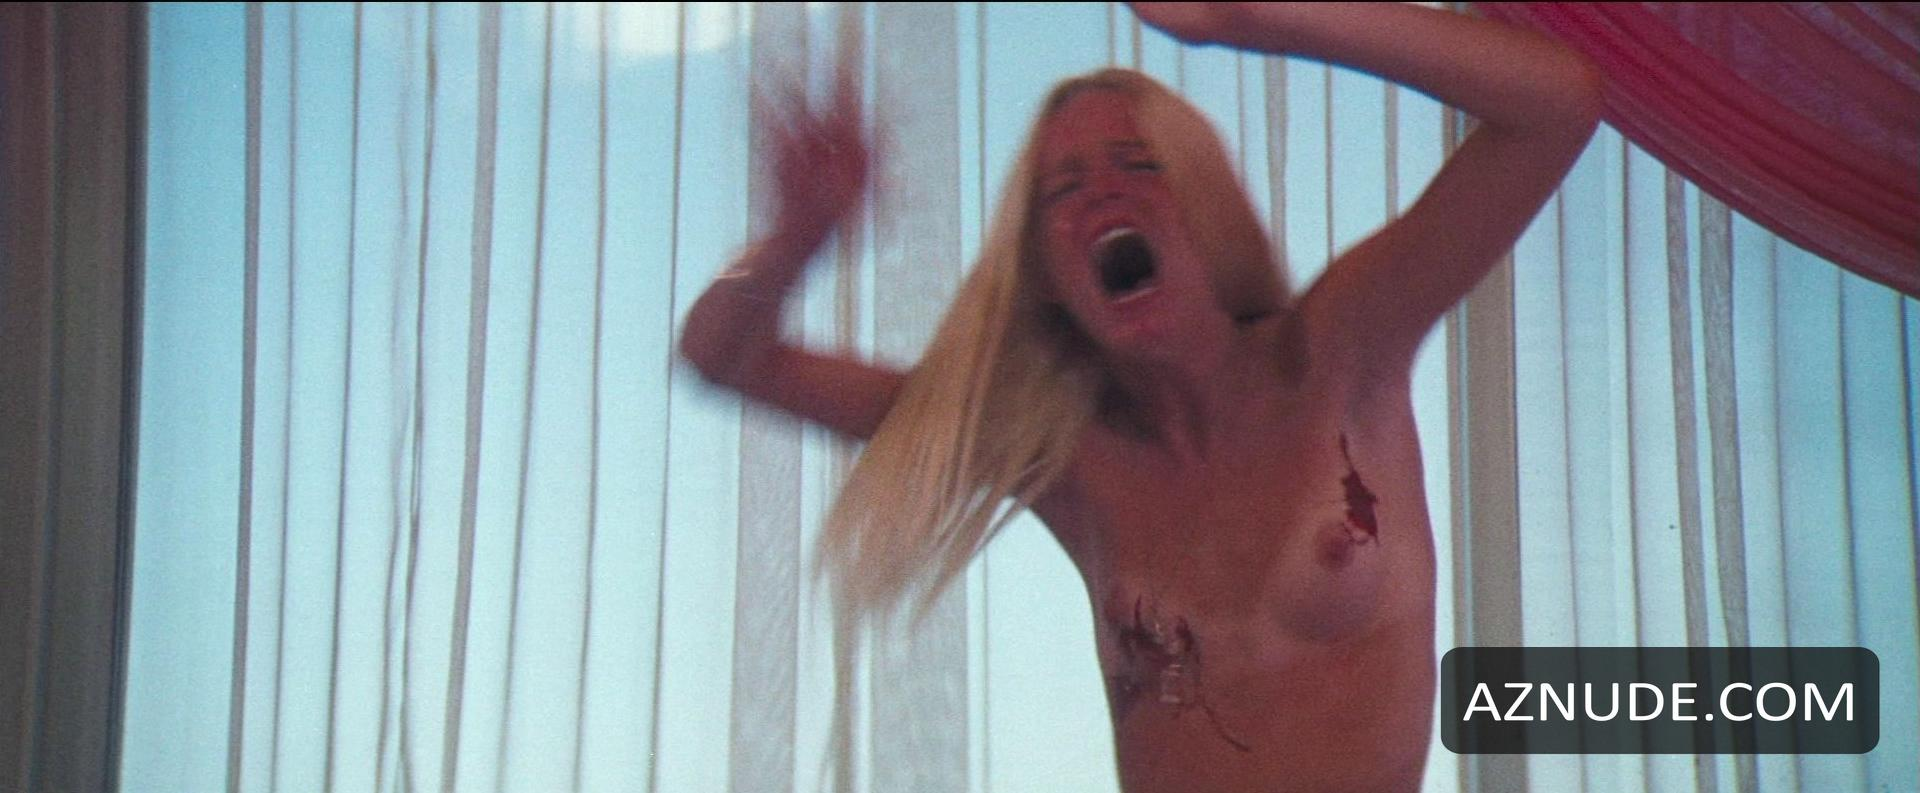 Valuable girls having three breasts nude scenes idea